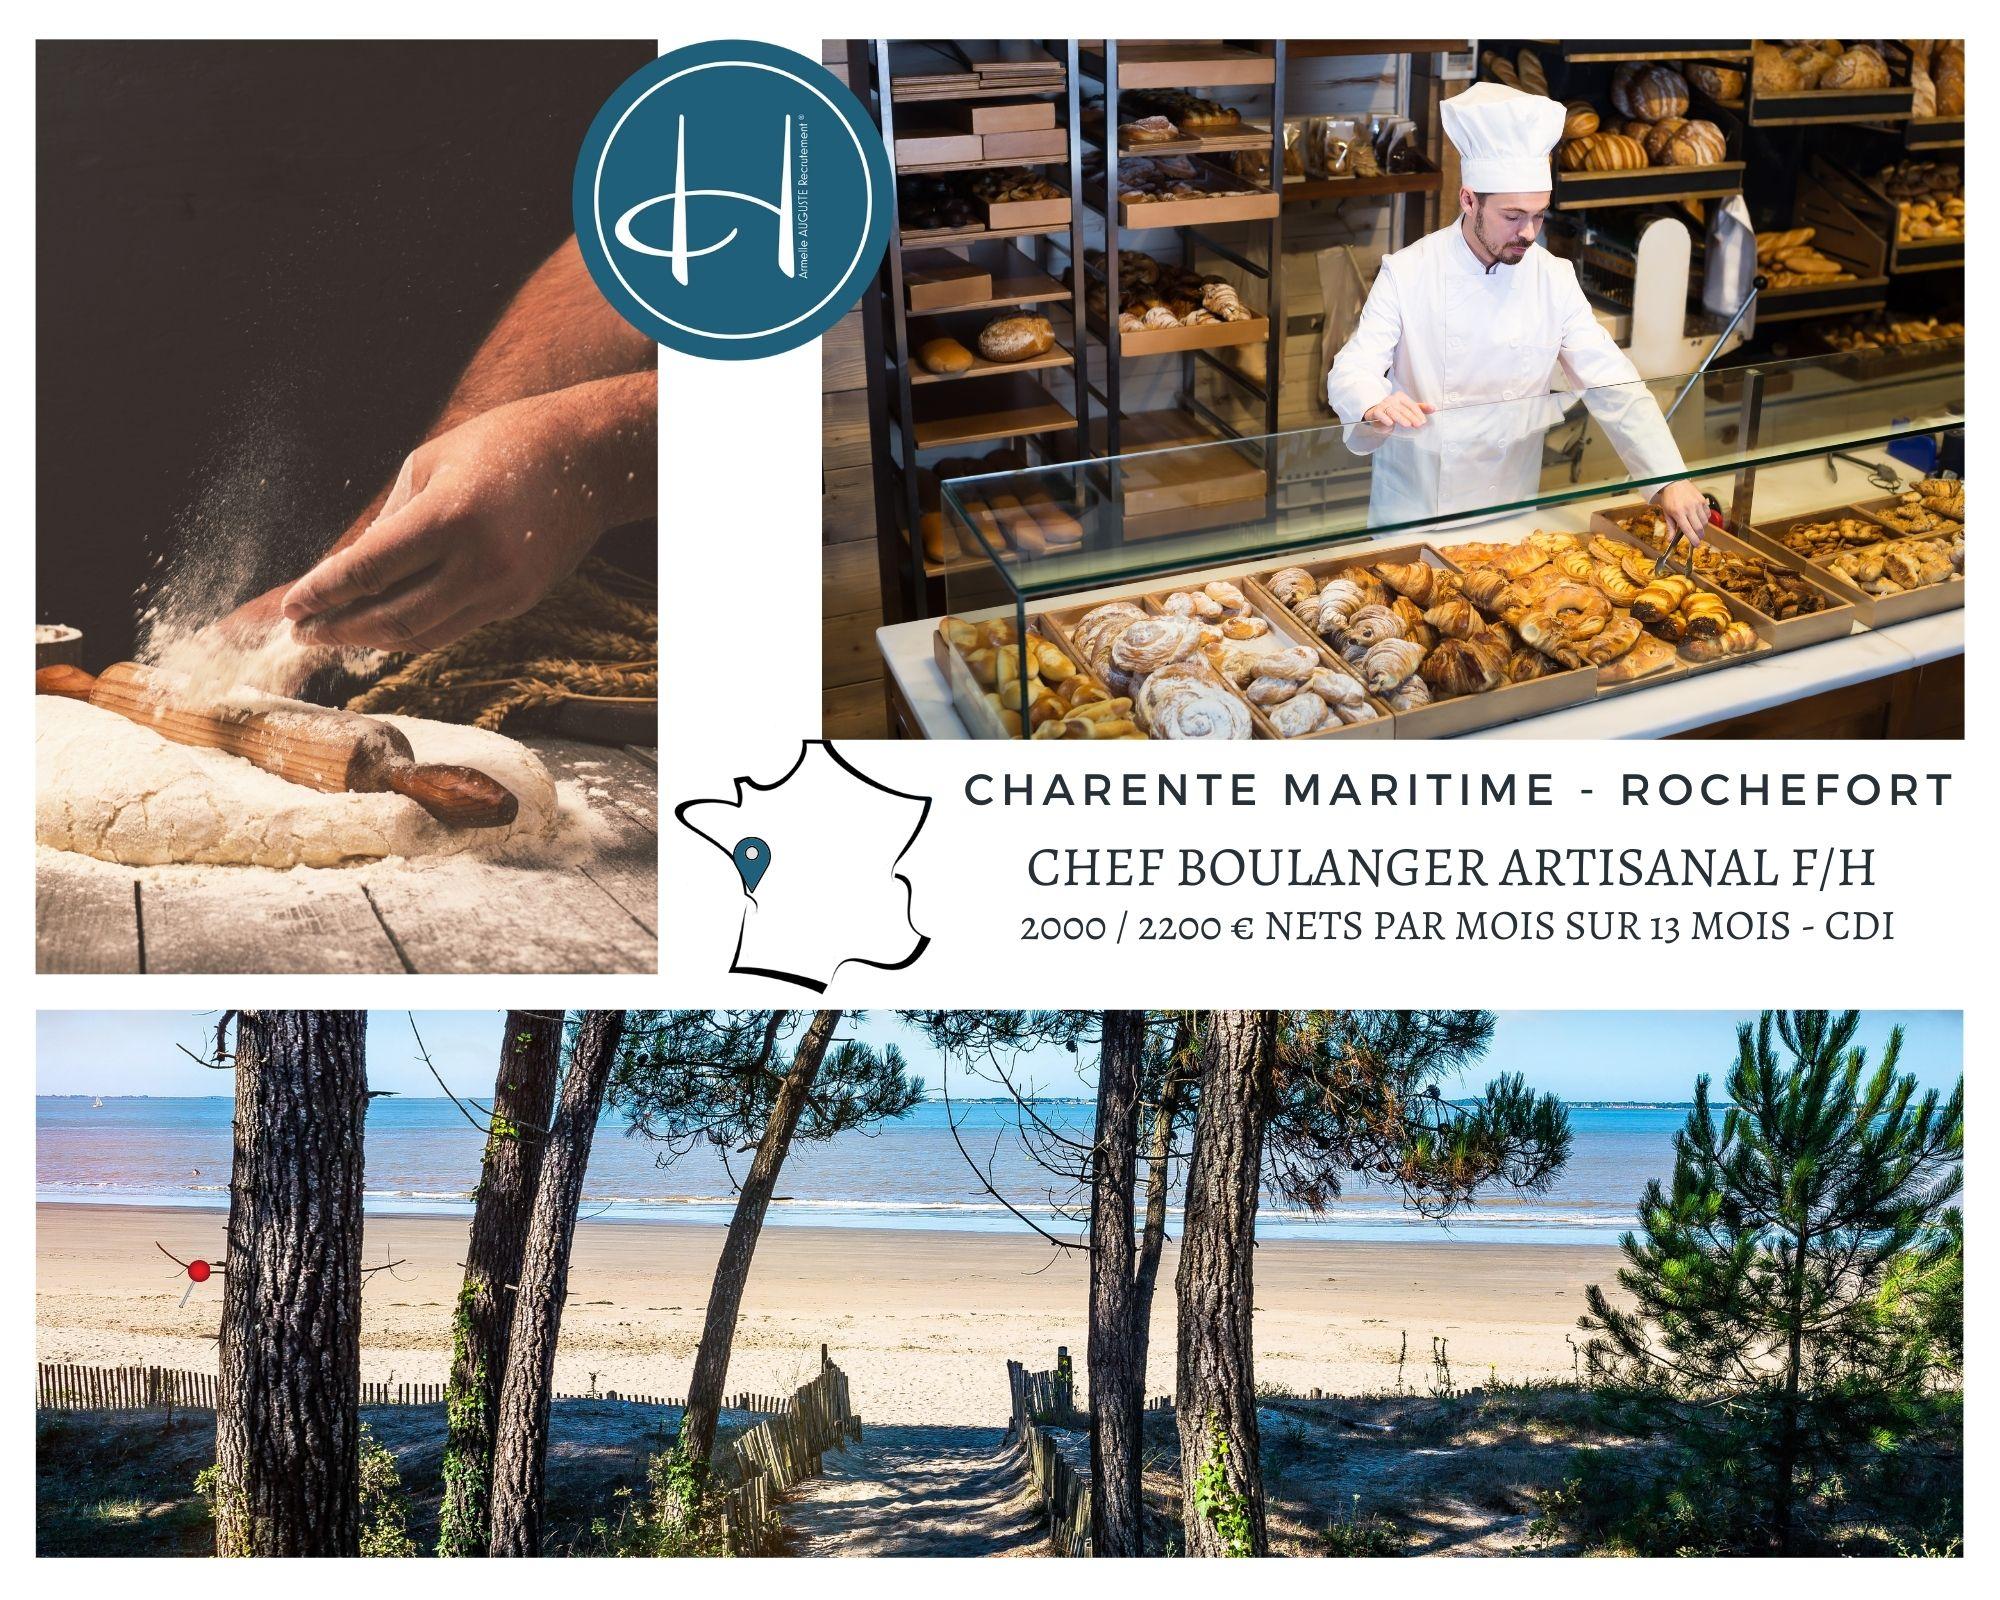 Recrutement: Chef Boulanger artisanal F/H chez Armelle AUGUSTE Recrutement® à Rochefort